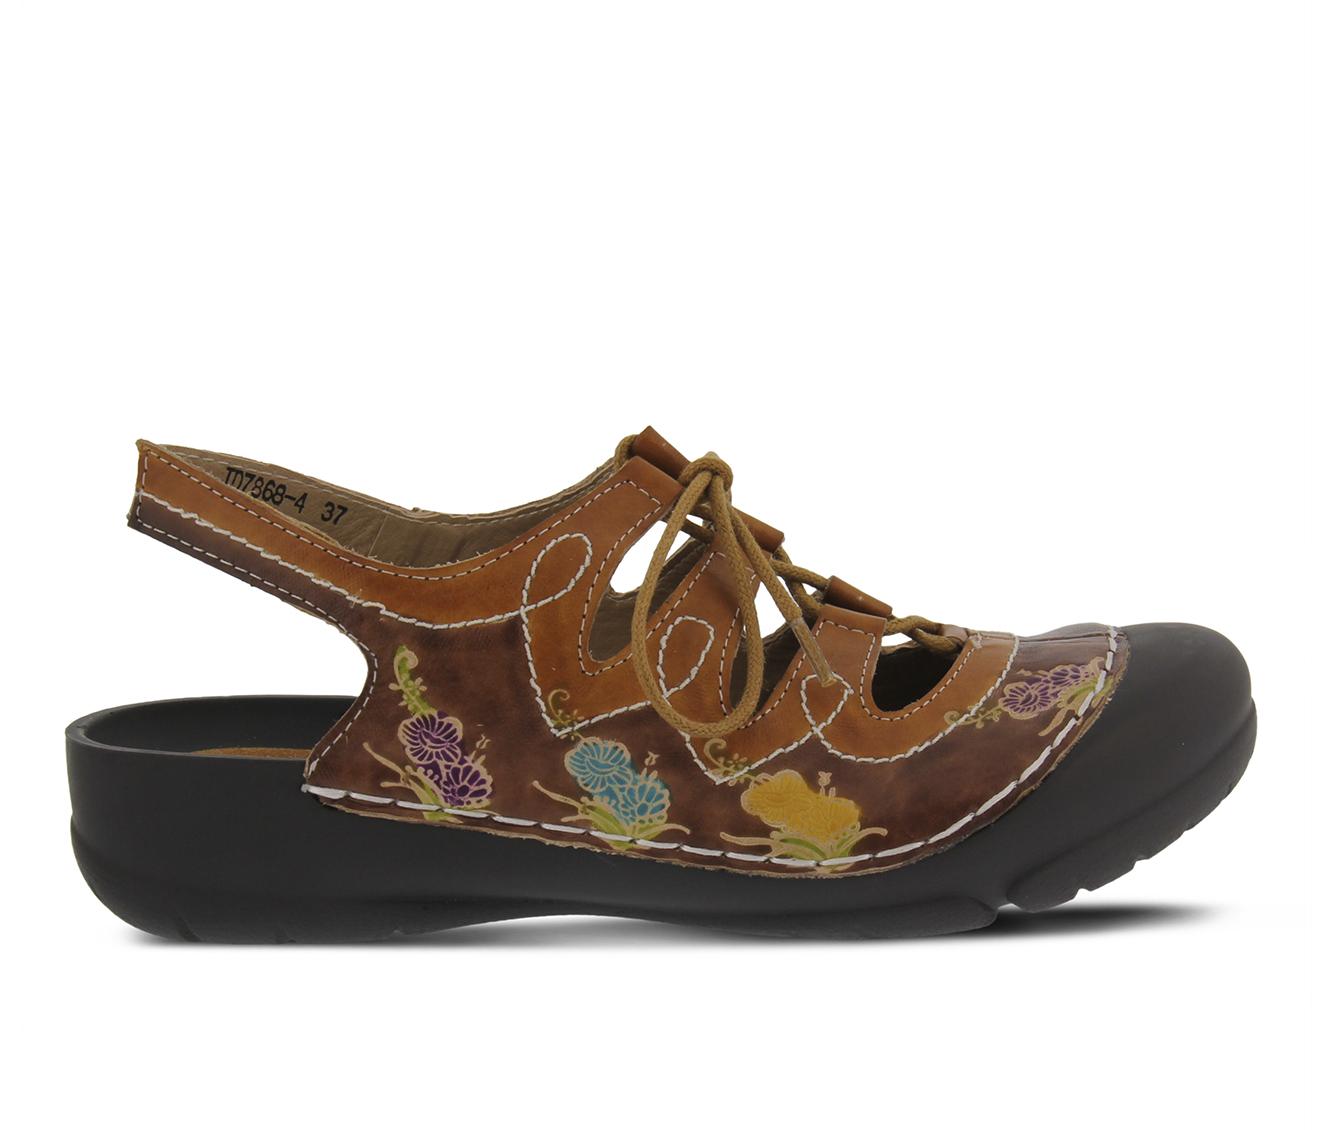 L'Artiste Vesta Women's Shoe (Brown Leather)